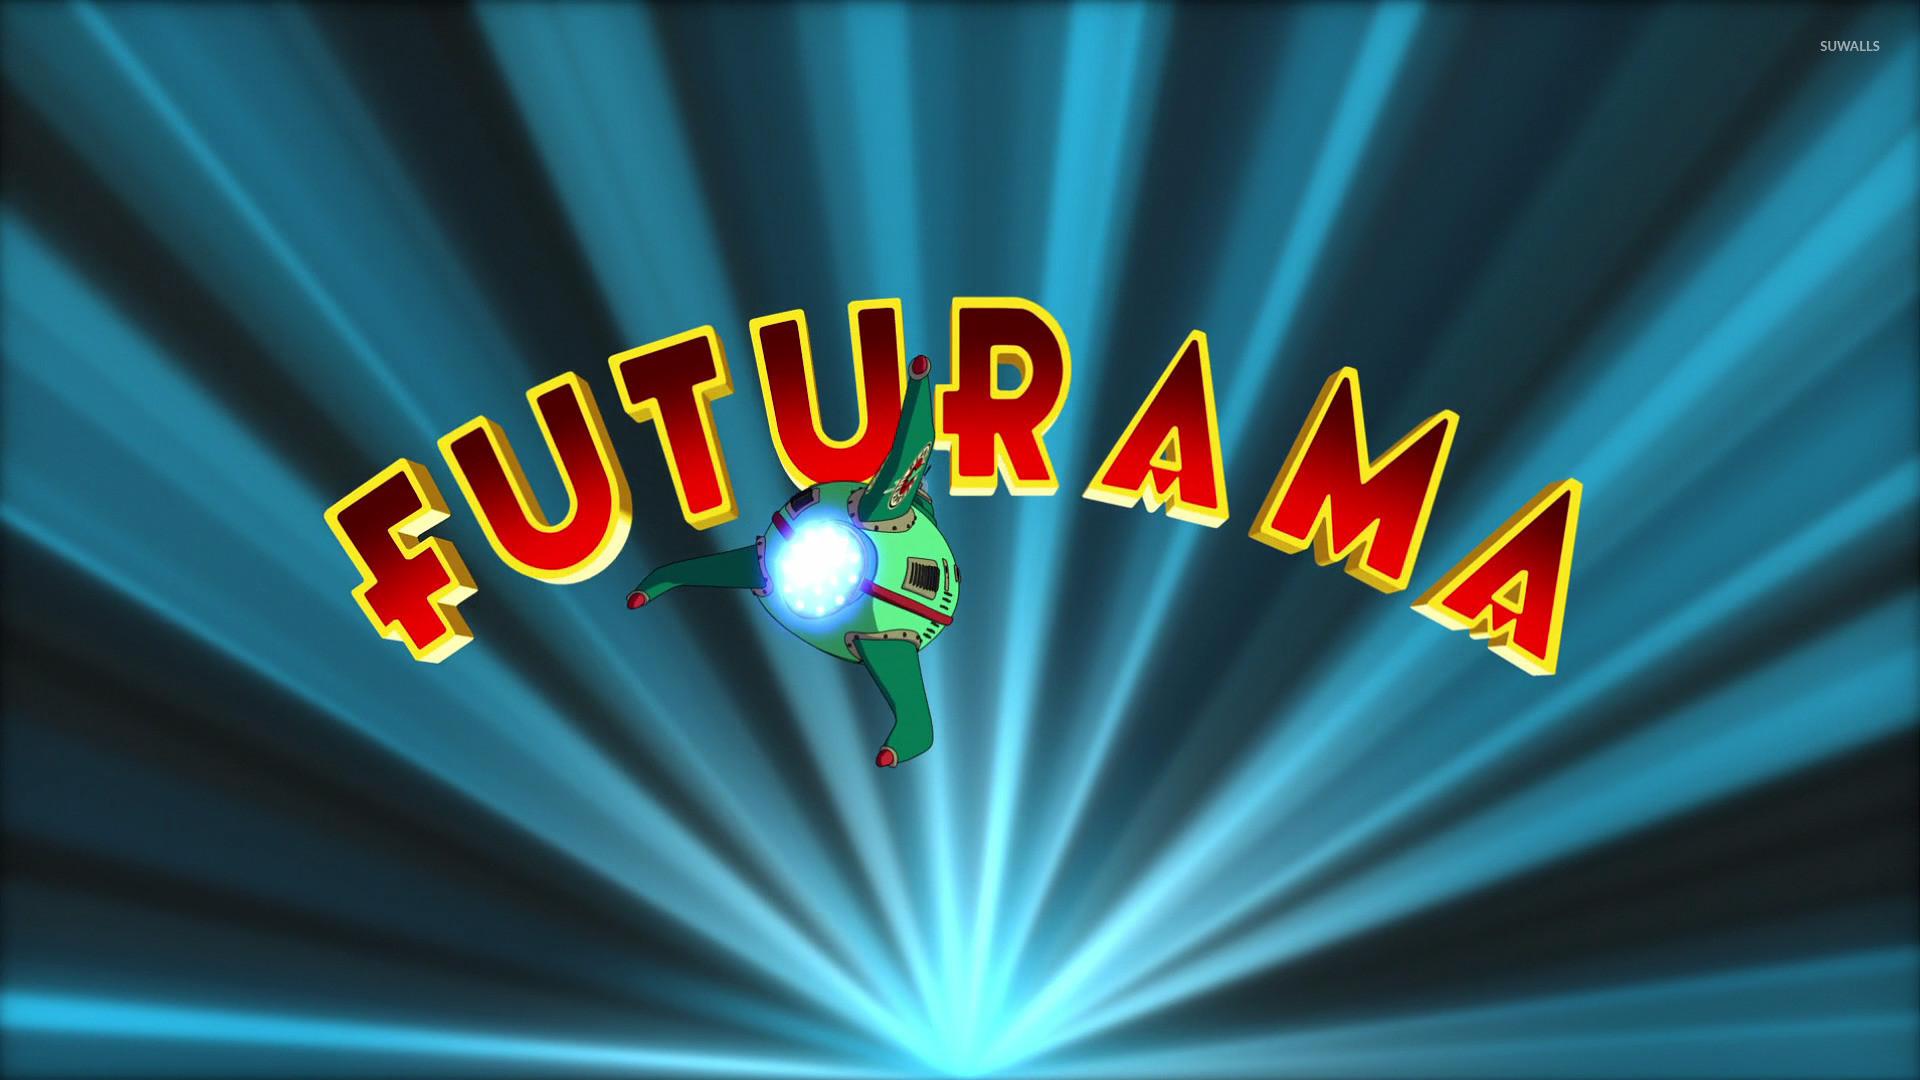 Futurama [5] wallpaper